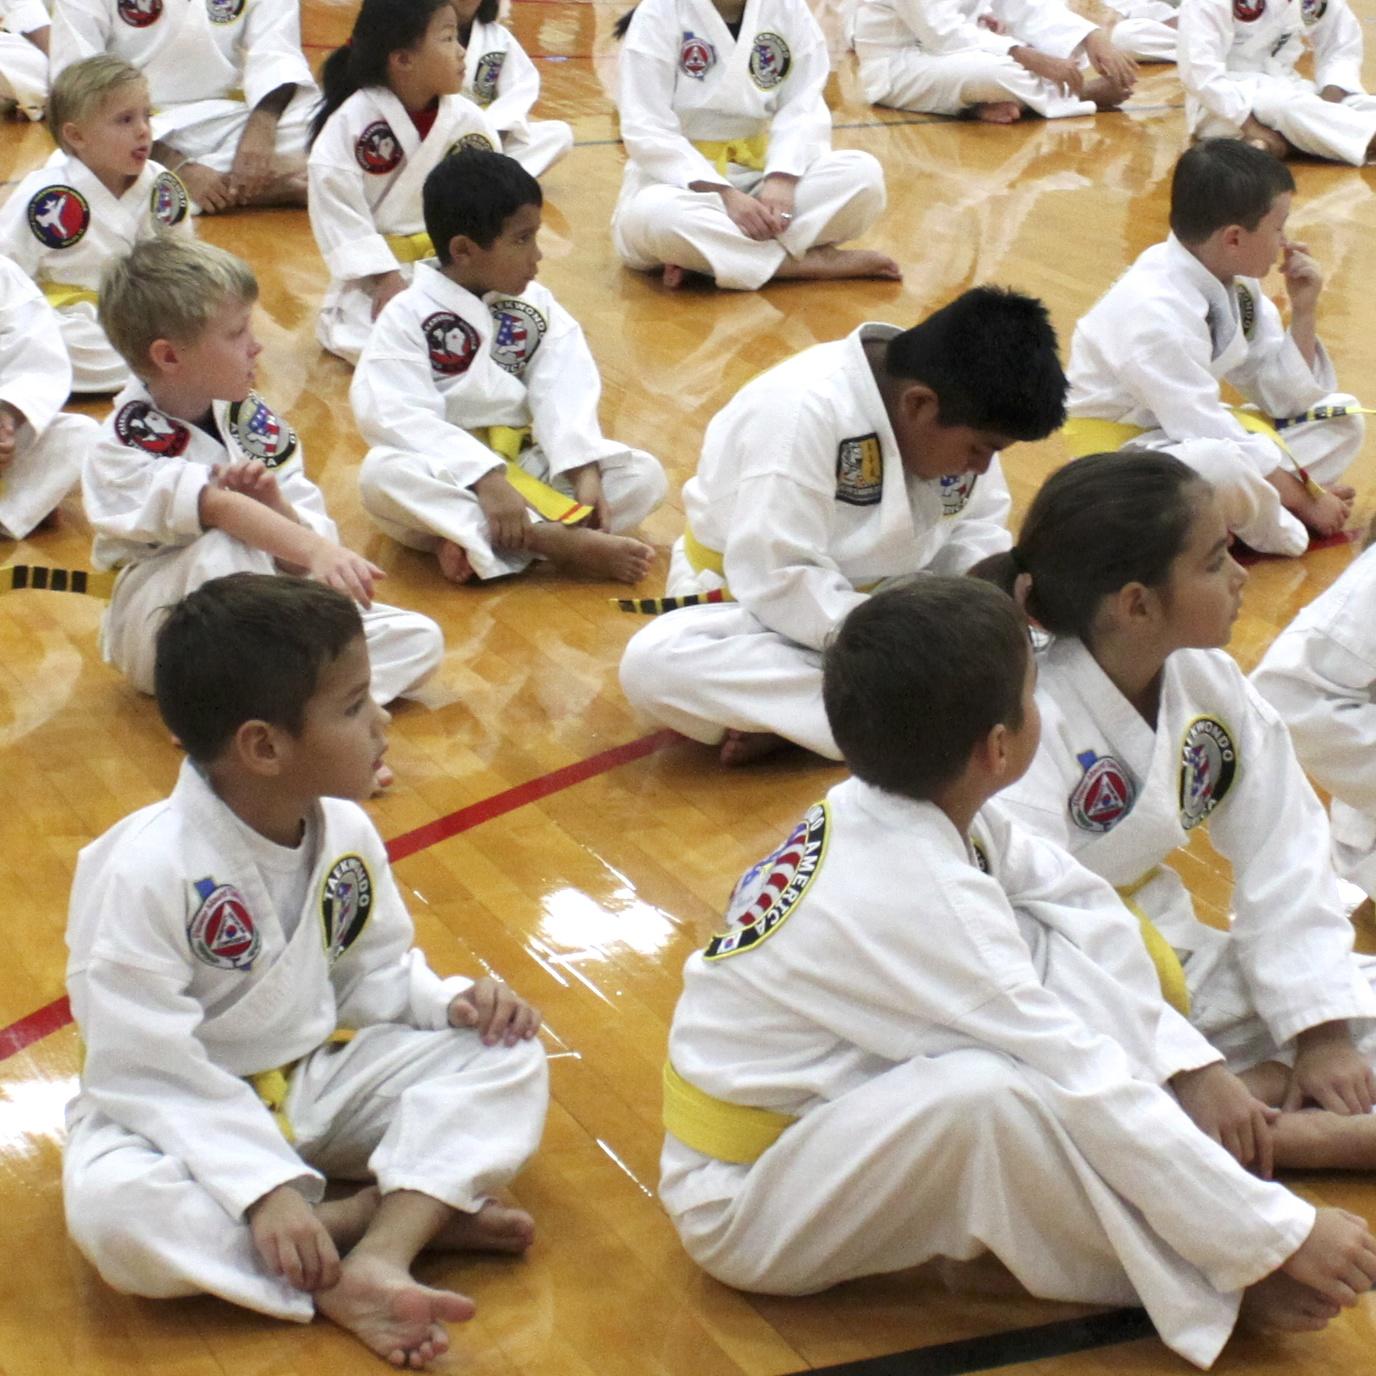 Teens Martial Arts Self-Defense Taekwondo Class Lexington KY.jpg